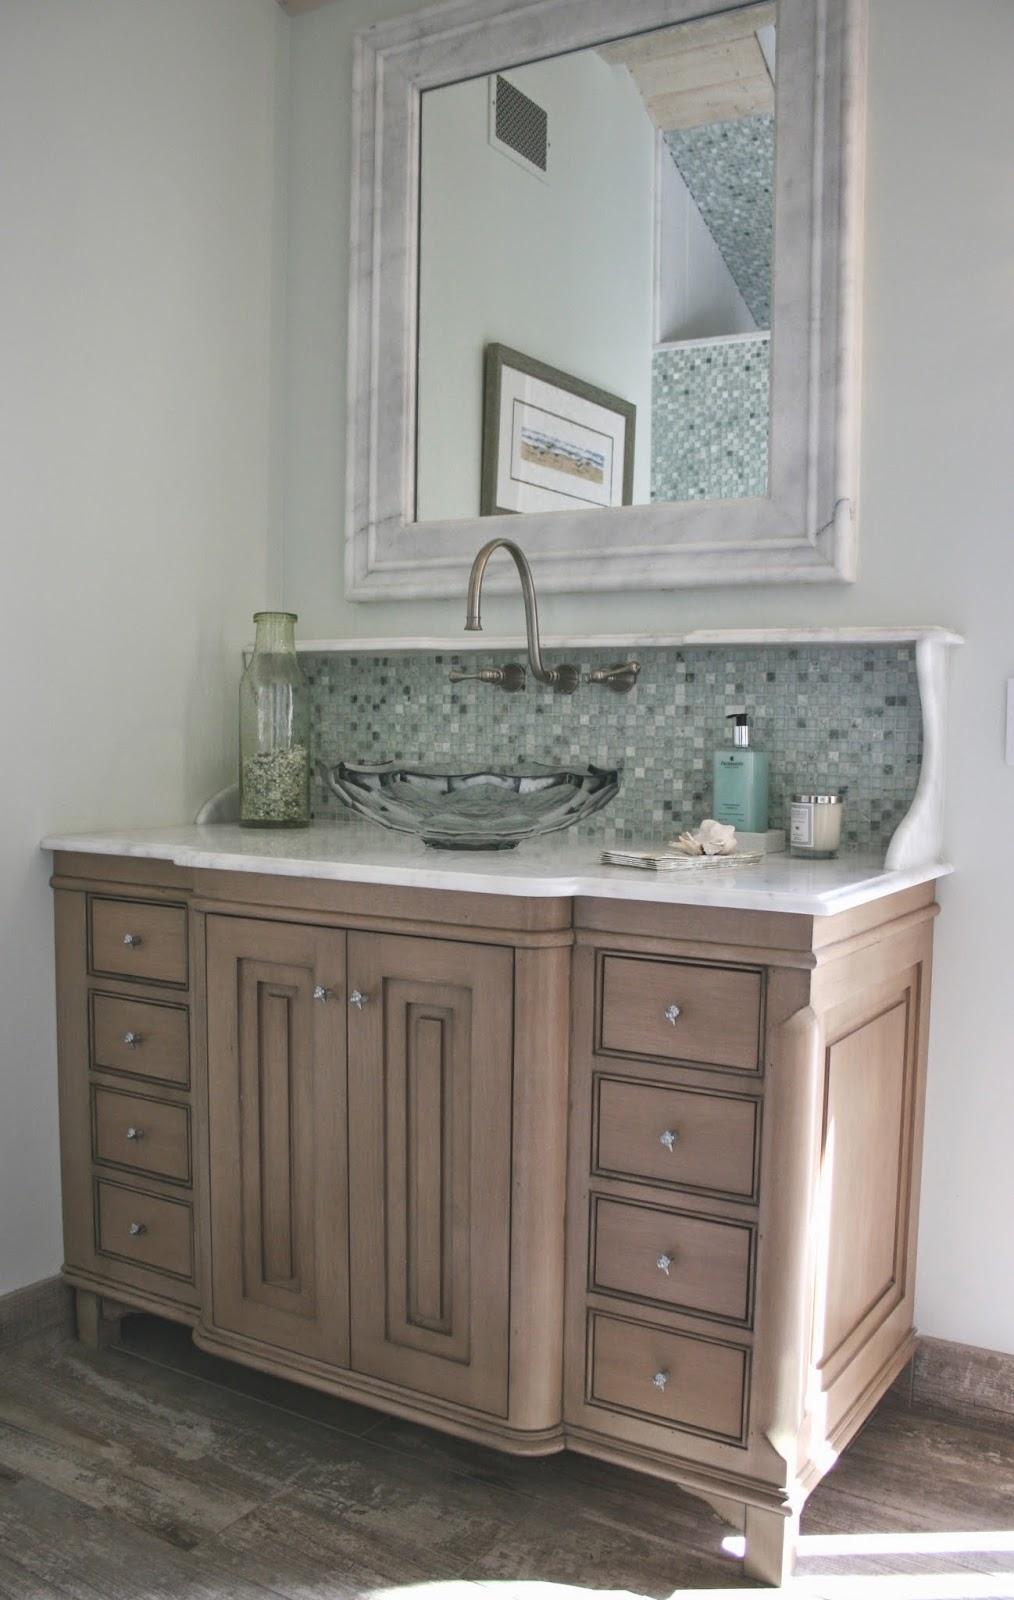 coastal bathroom vanities ideas on foter rh foter com coastal style bathroom vanity 30 coastal bathroom vanity